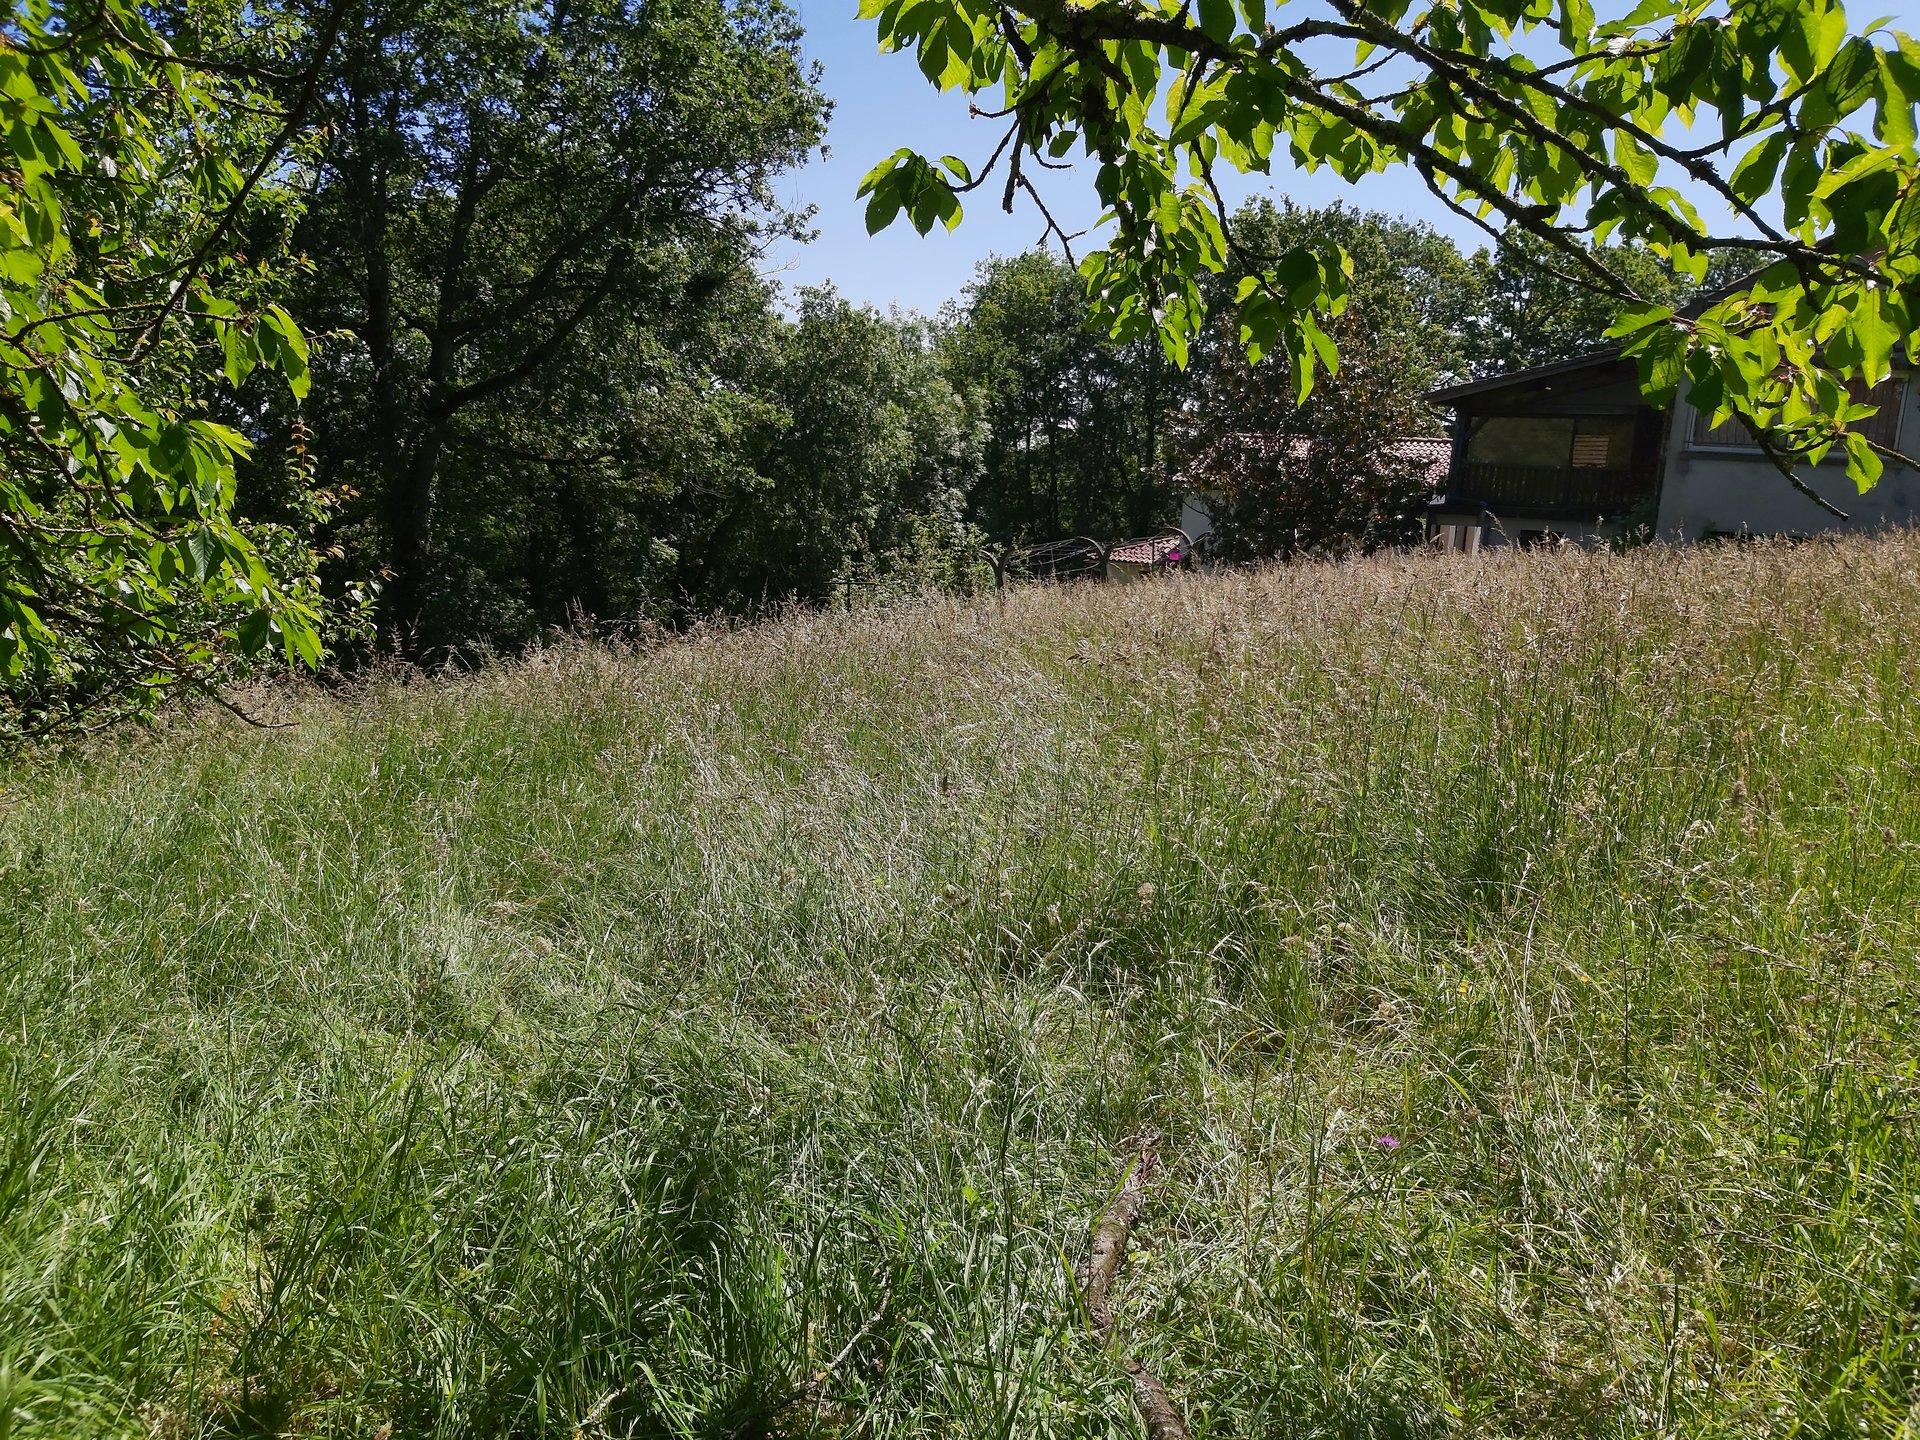 Exclusif Aurignac terrain à batir avec arbres fruitiers